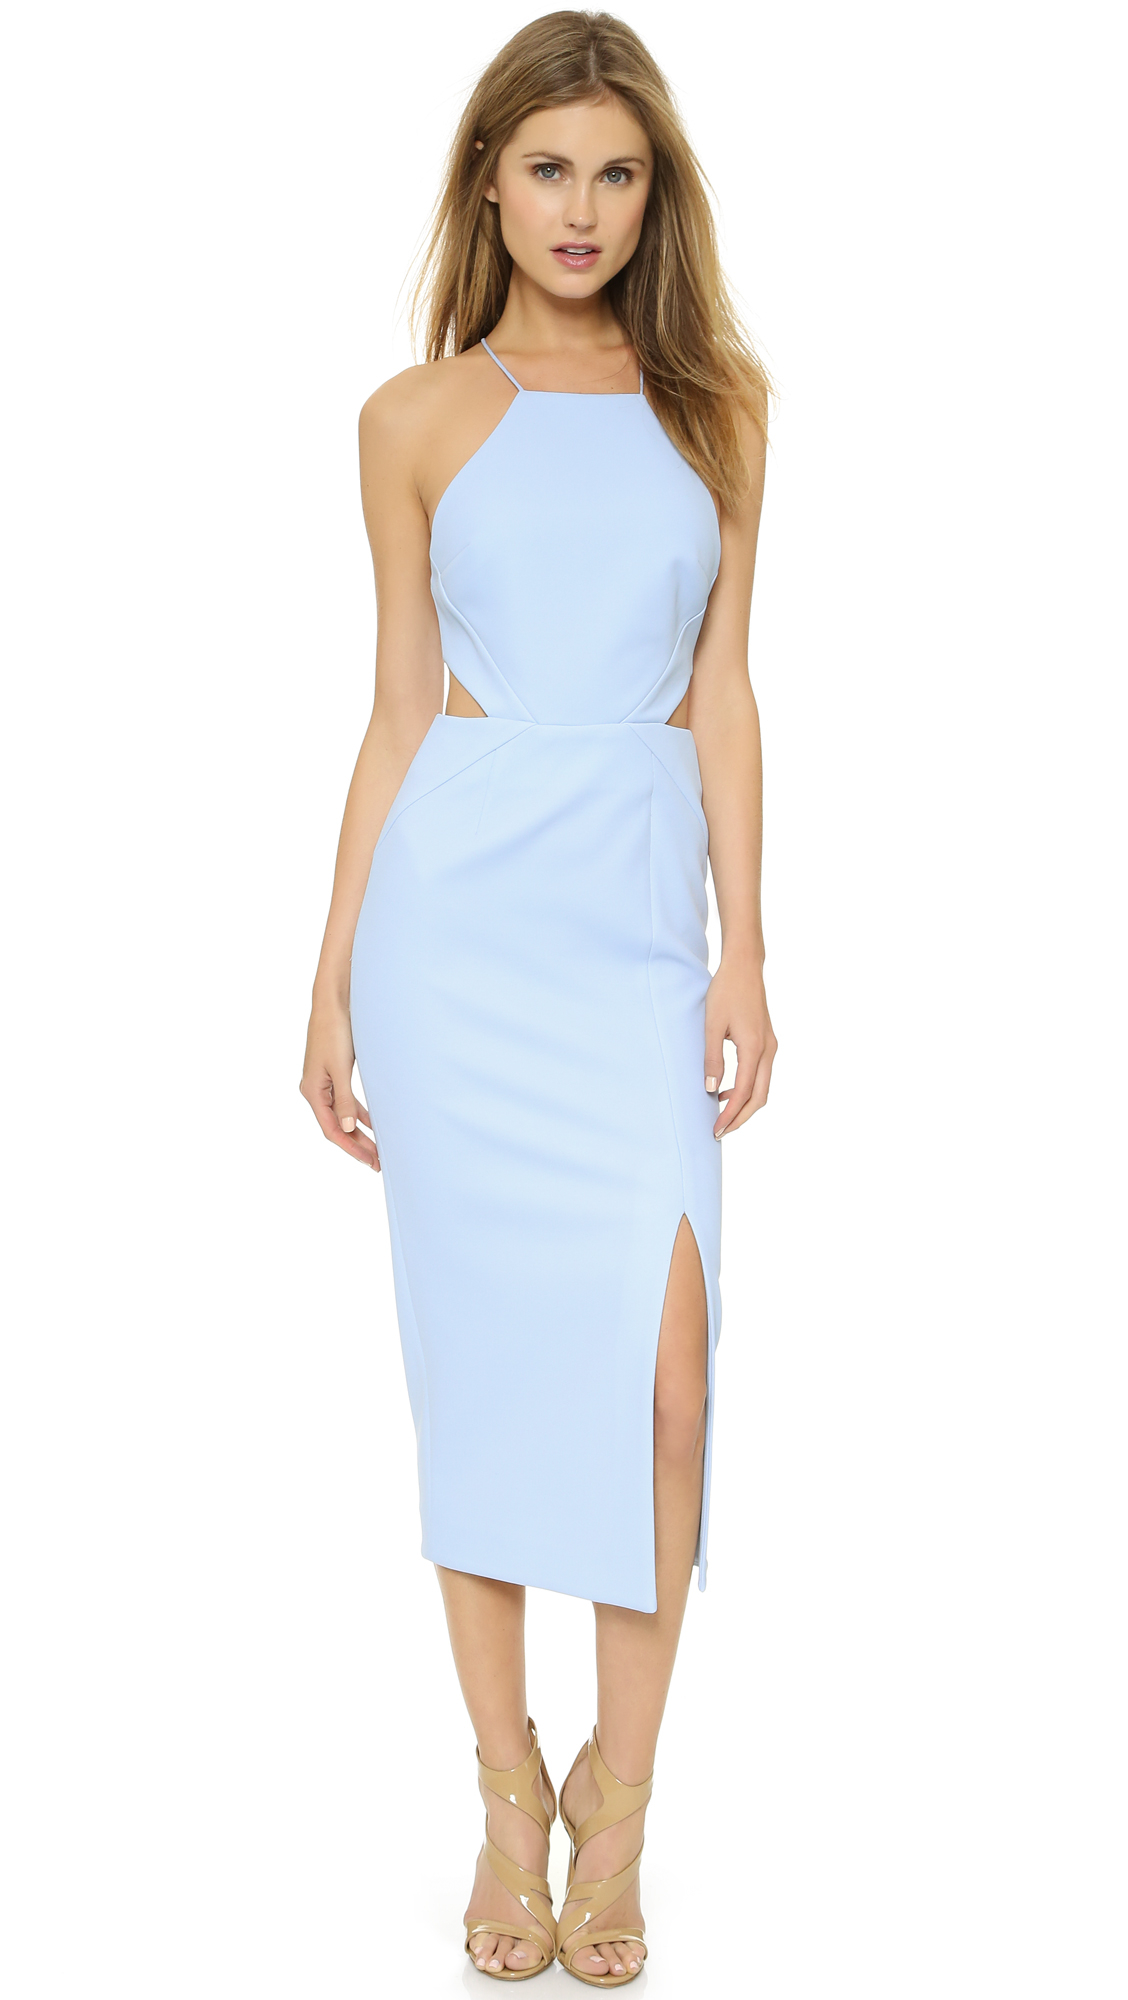 478e837c4952 Lyst - Nicholas Cut-Out Fitted Midi Dress in Blue